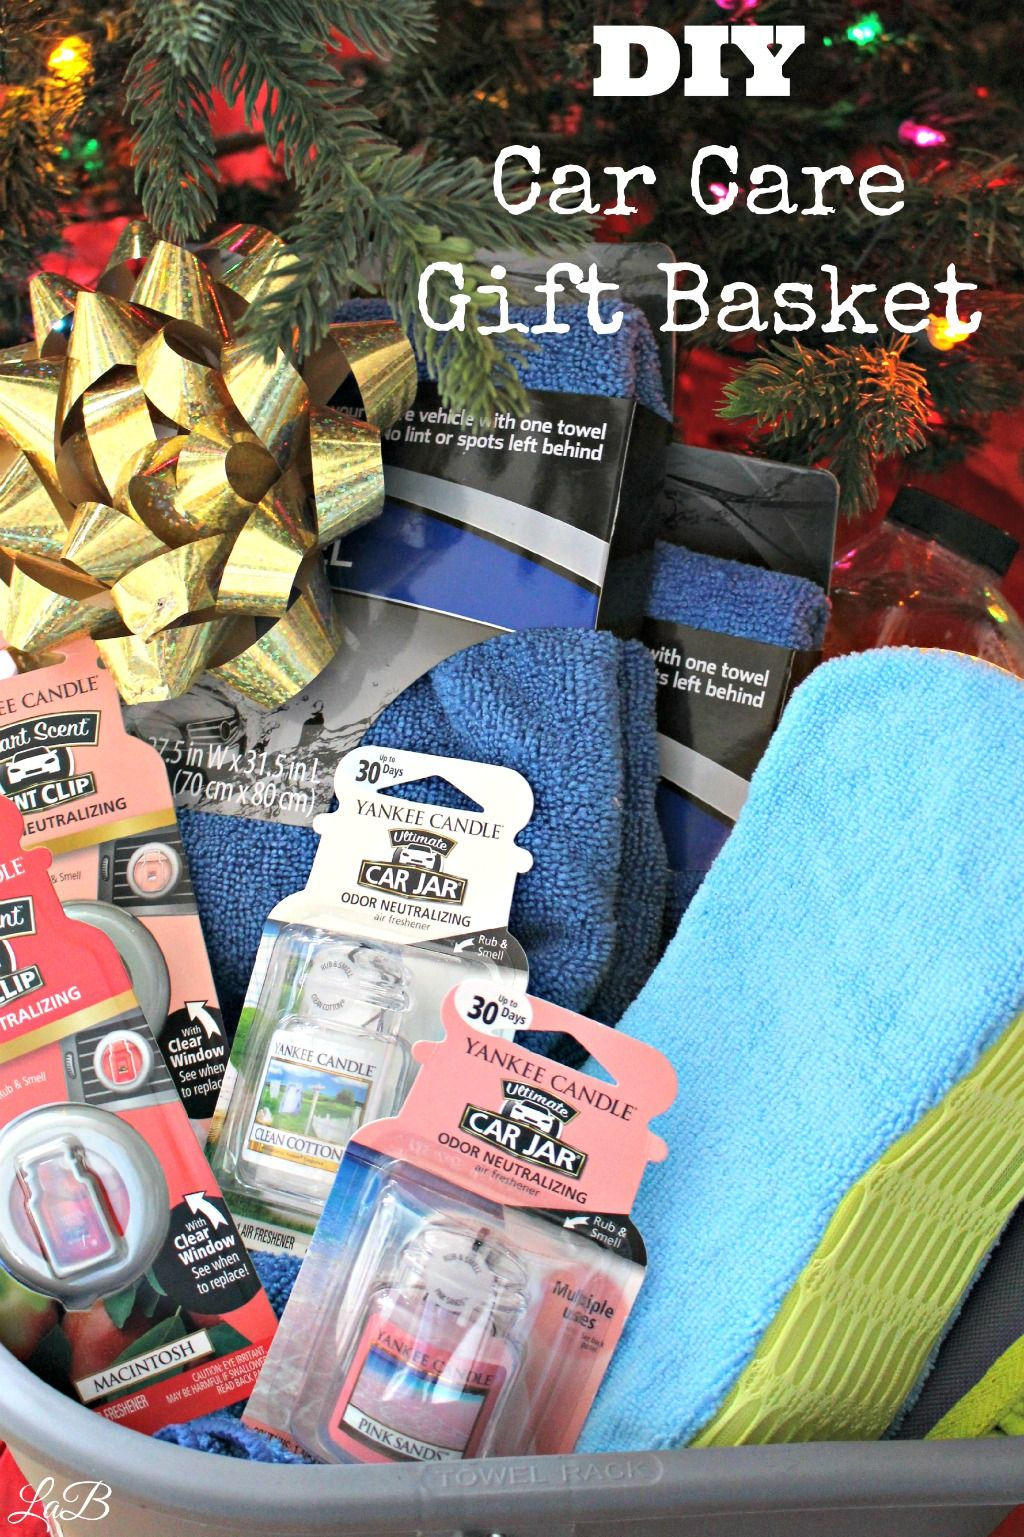 diy car care gift basket christmas season pinterest gift baskets gifts and diy gift baskets. Black Bedroom Furniture Sets. Home Design Ideas